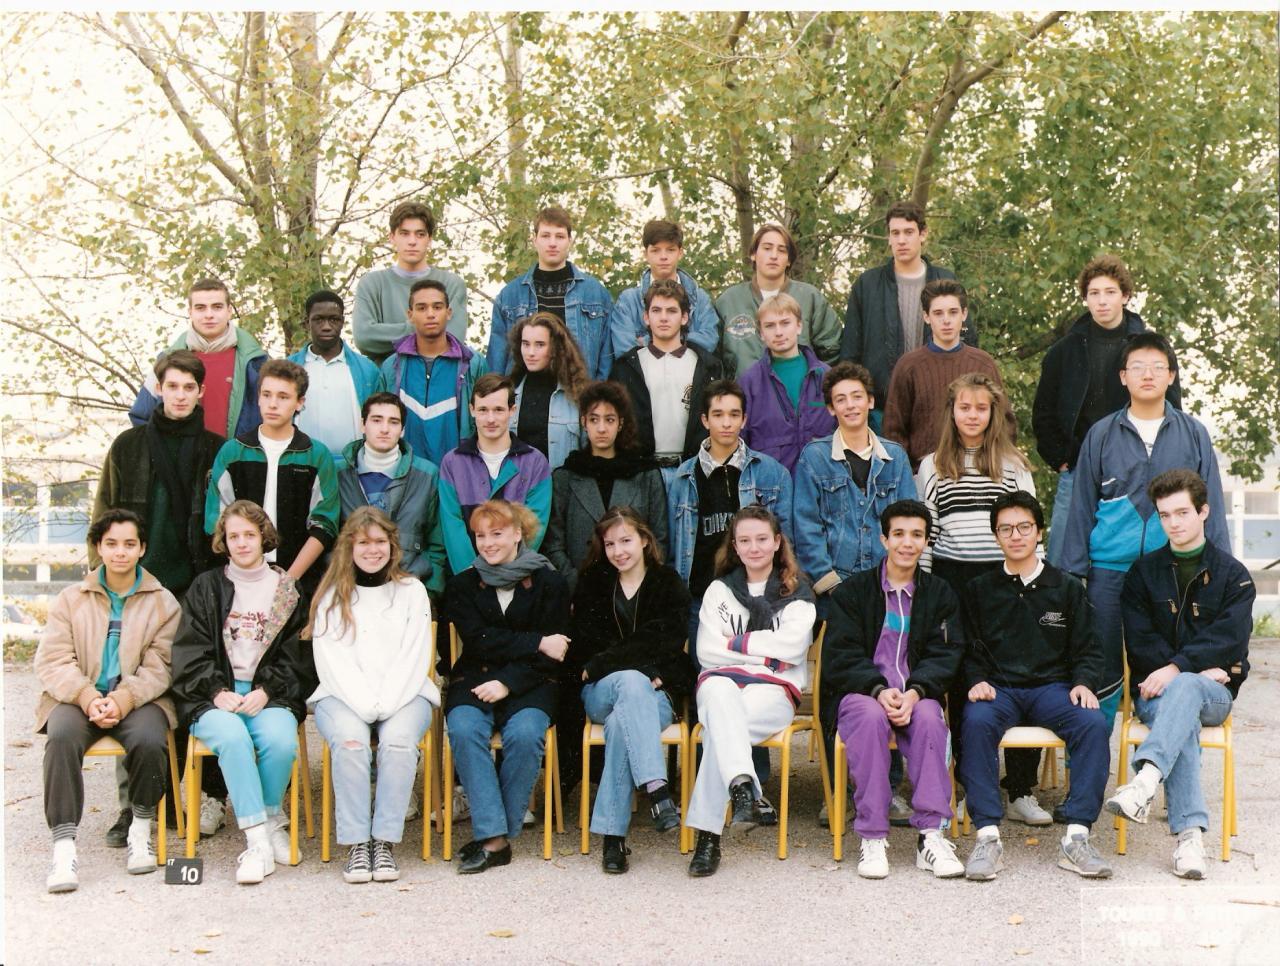 1991 - 1 S1